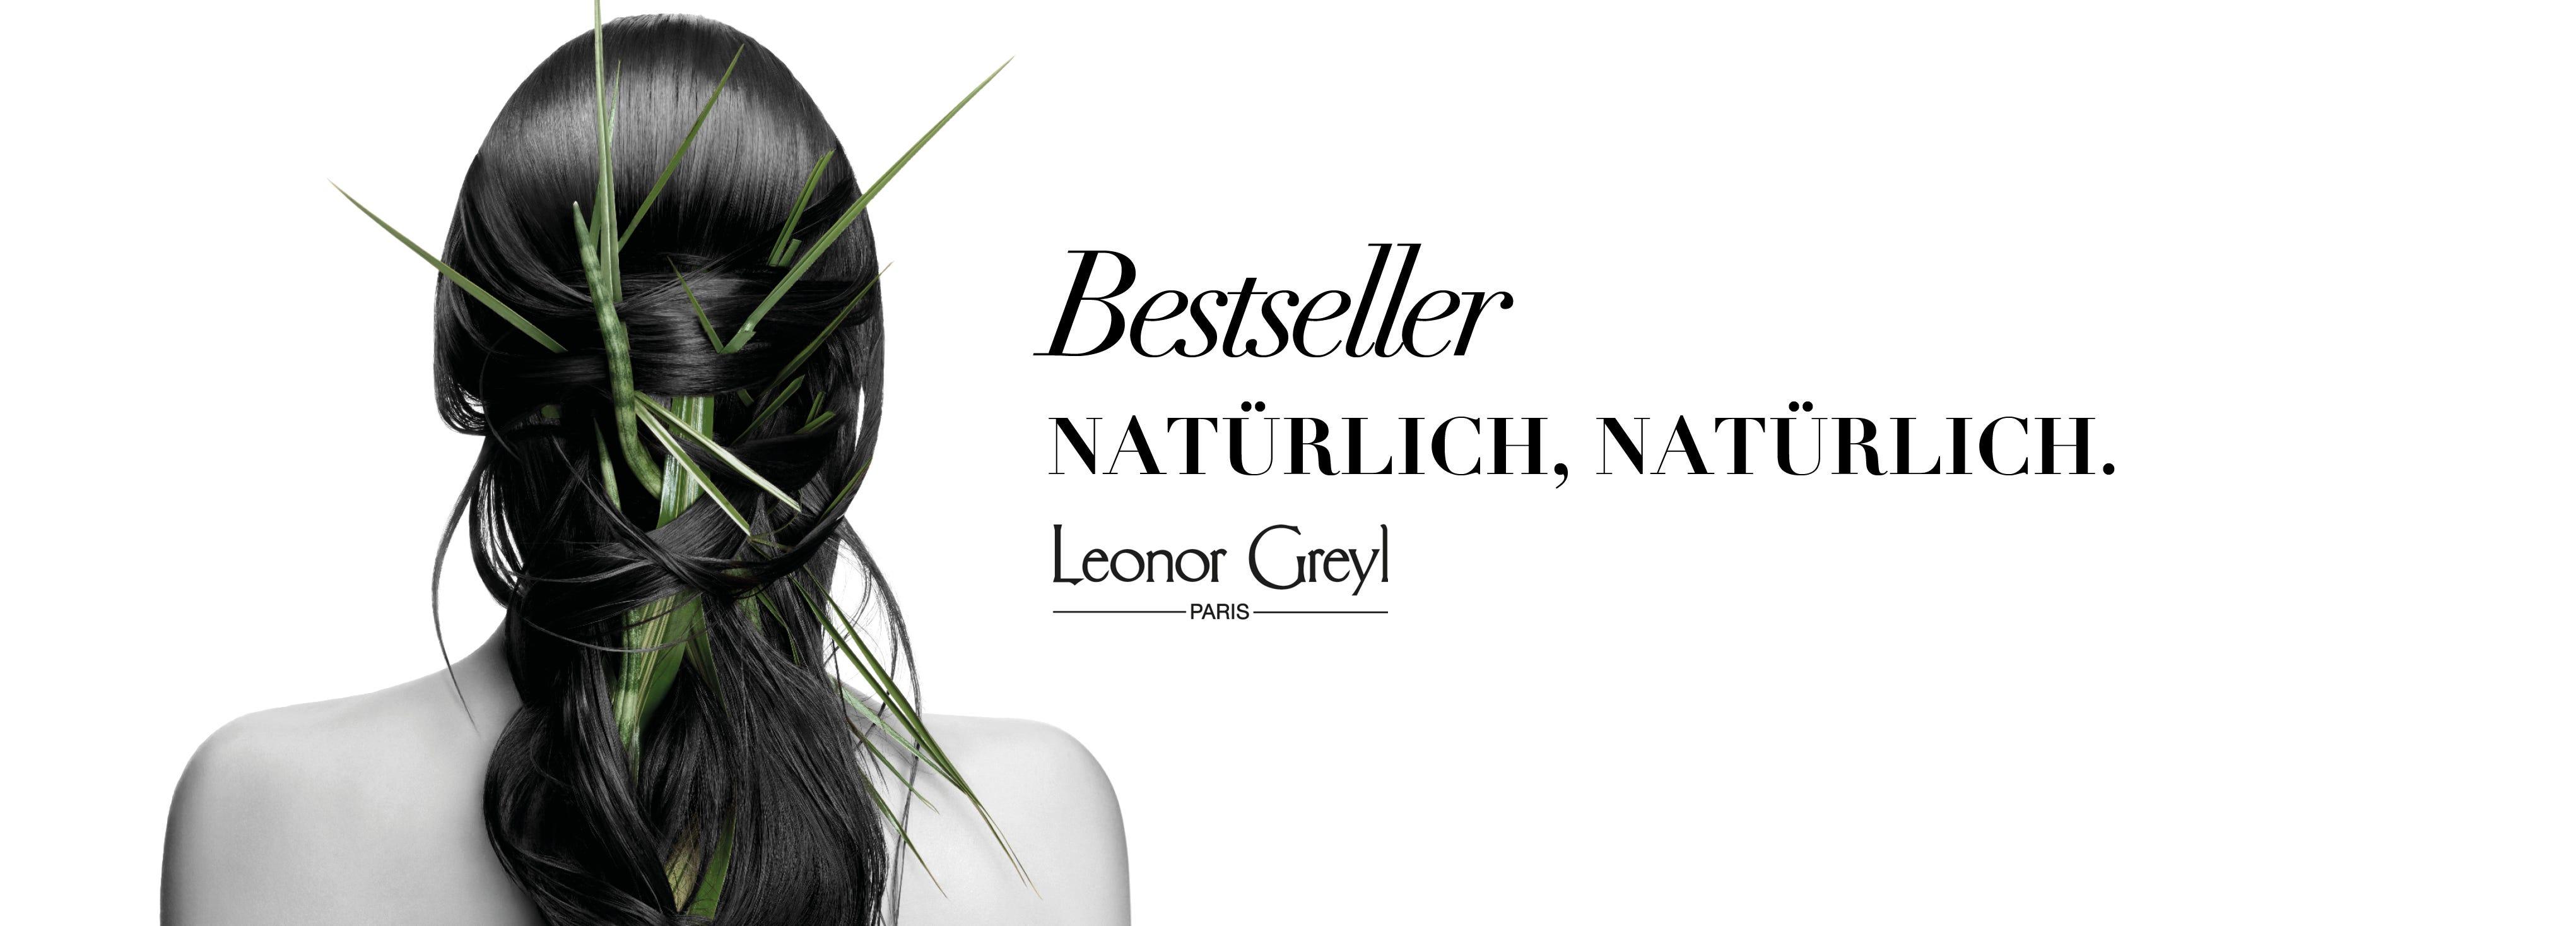 Leonor Greyl Bestseller